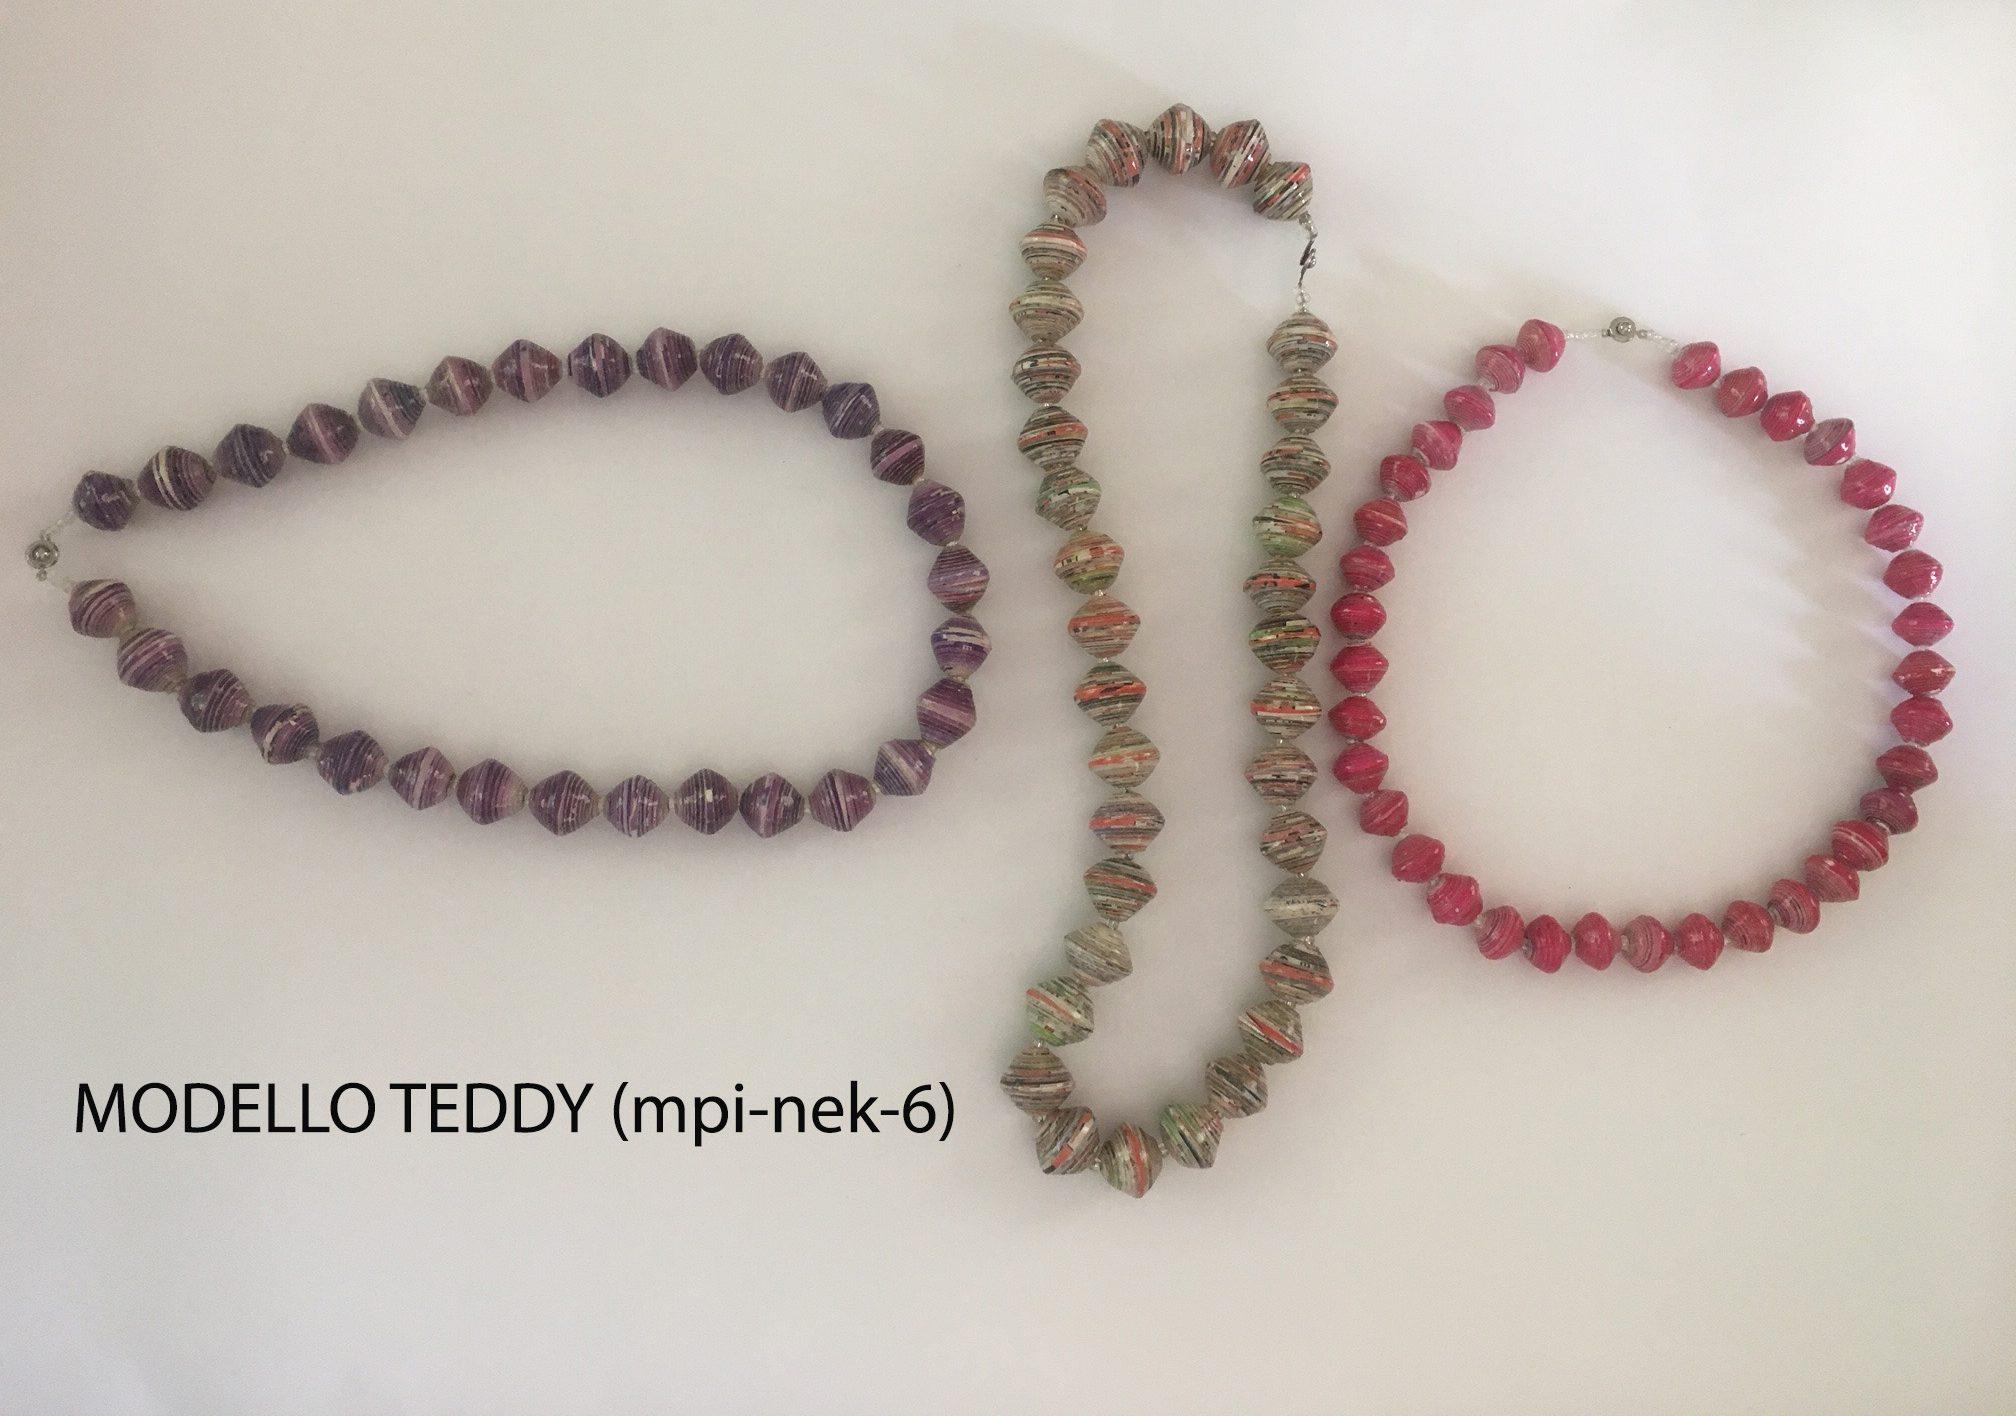 Modello Teddy (mpi-nek-6)